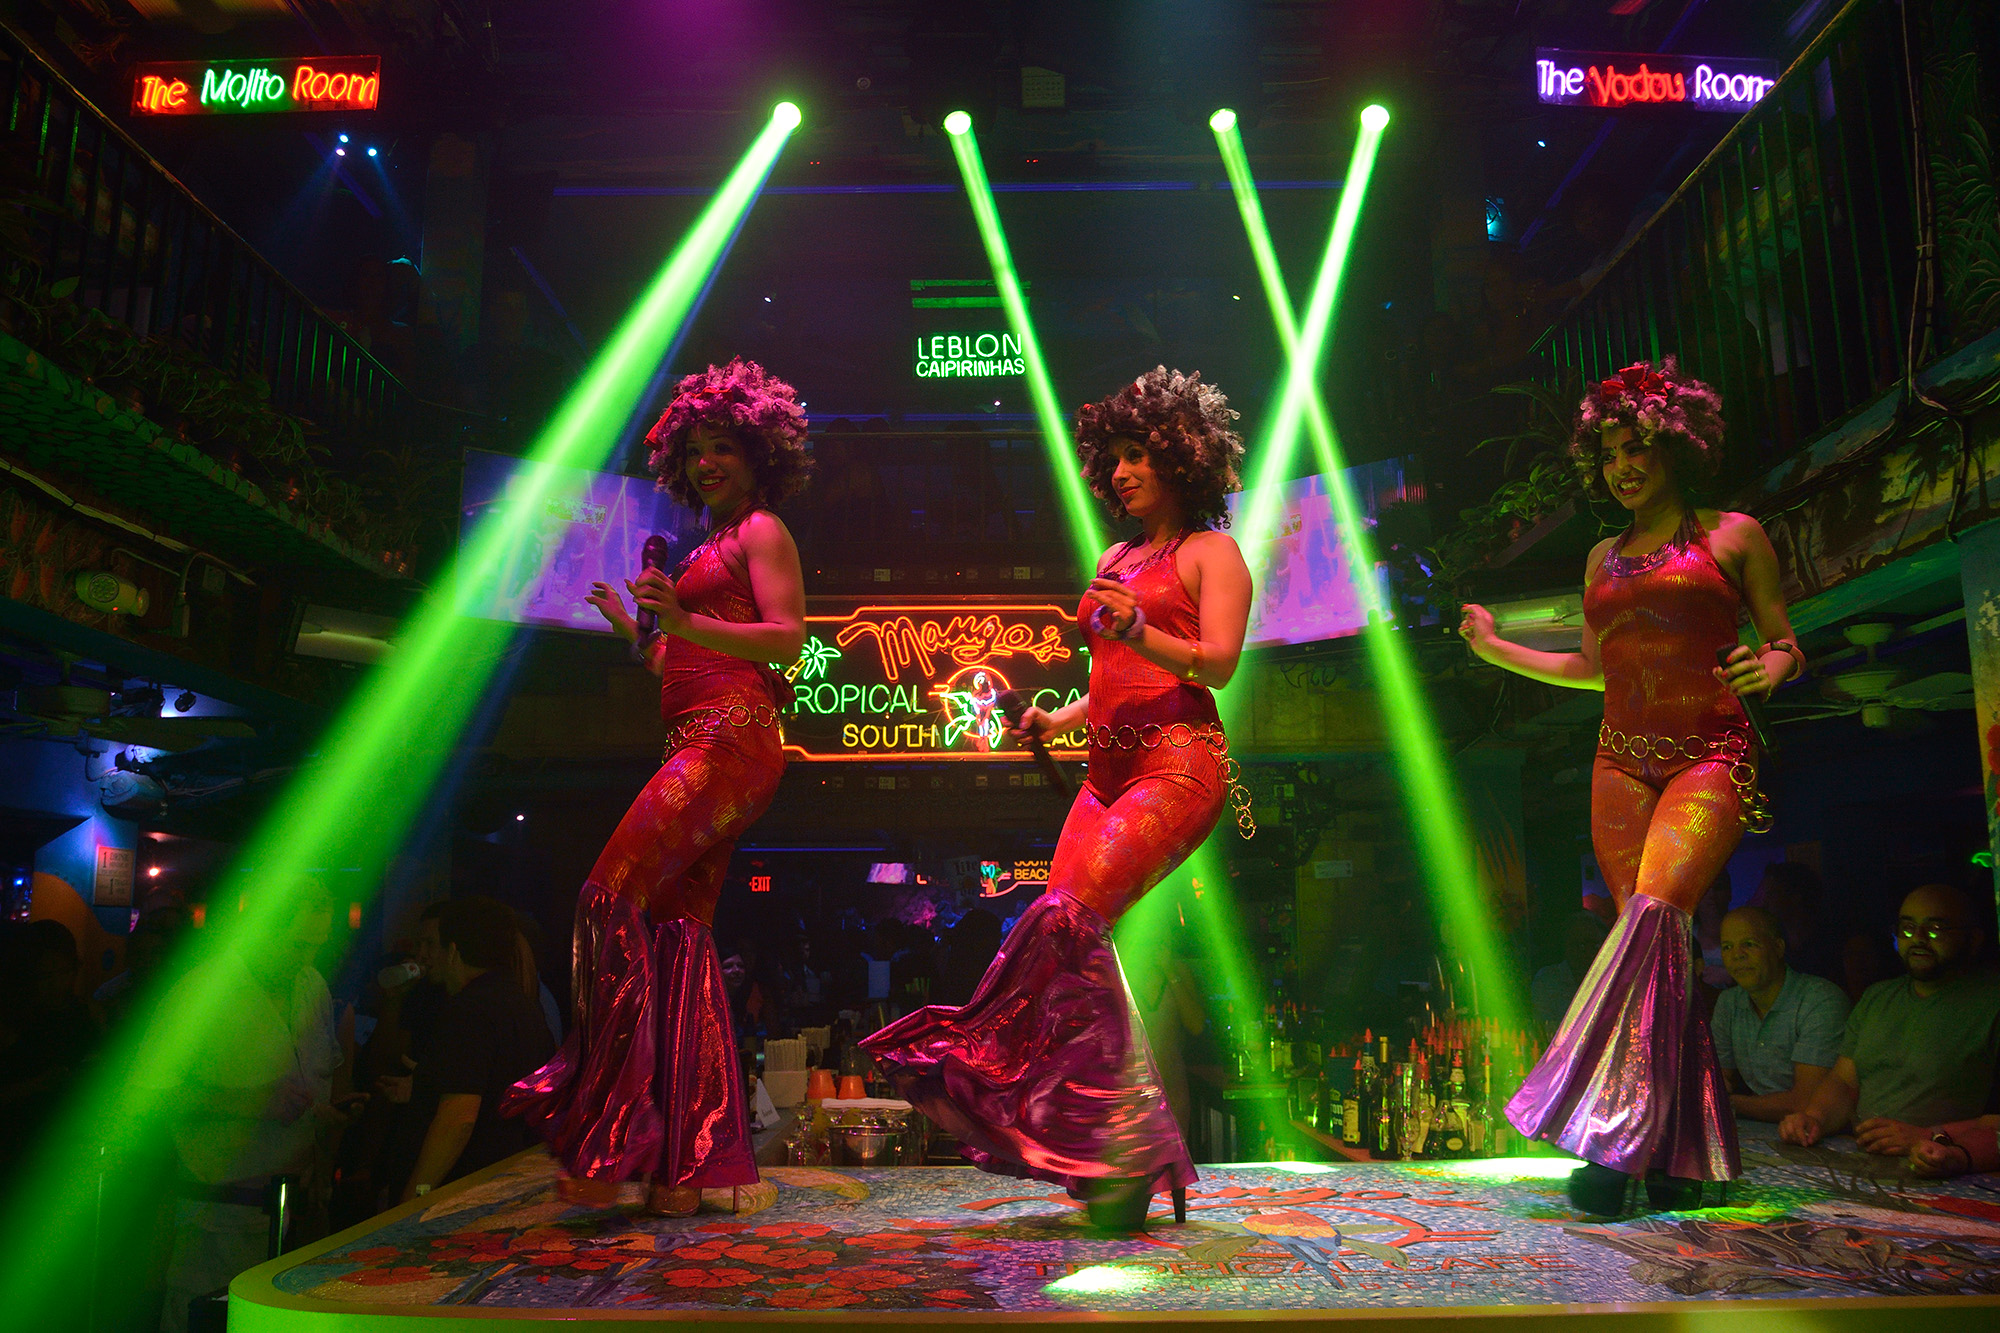 Sigma 17 50 Mm F 28 Ex Dc Os Hsm Test 50mm Dg Macro Canon Review Miami Beach Dansclub Photo